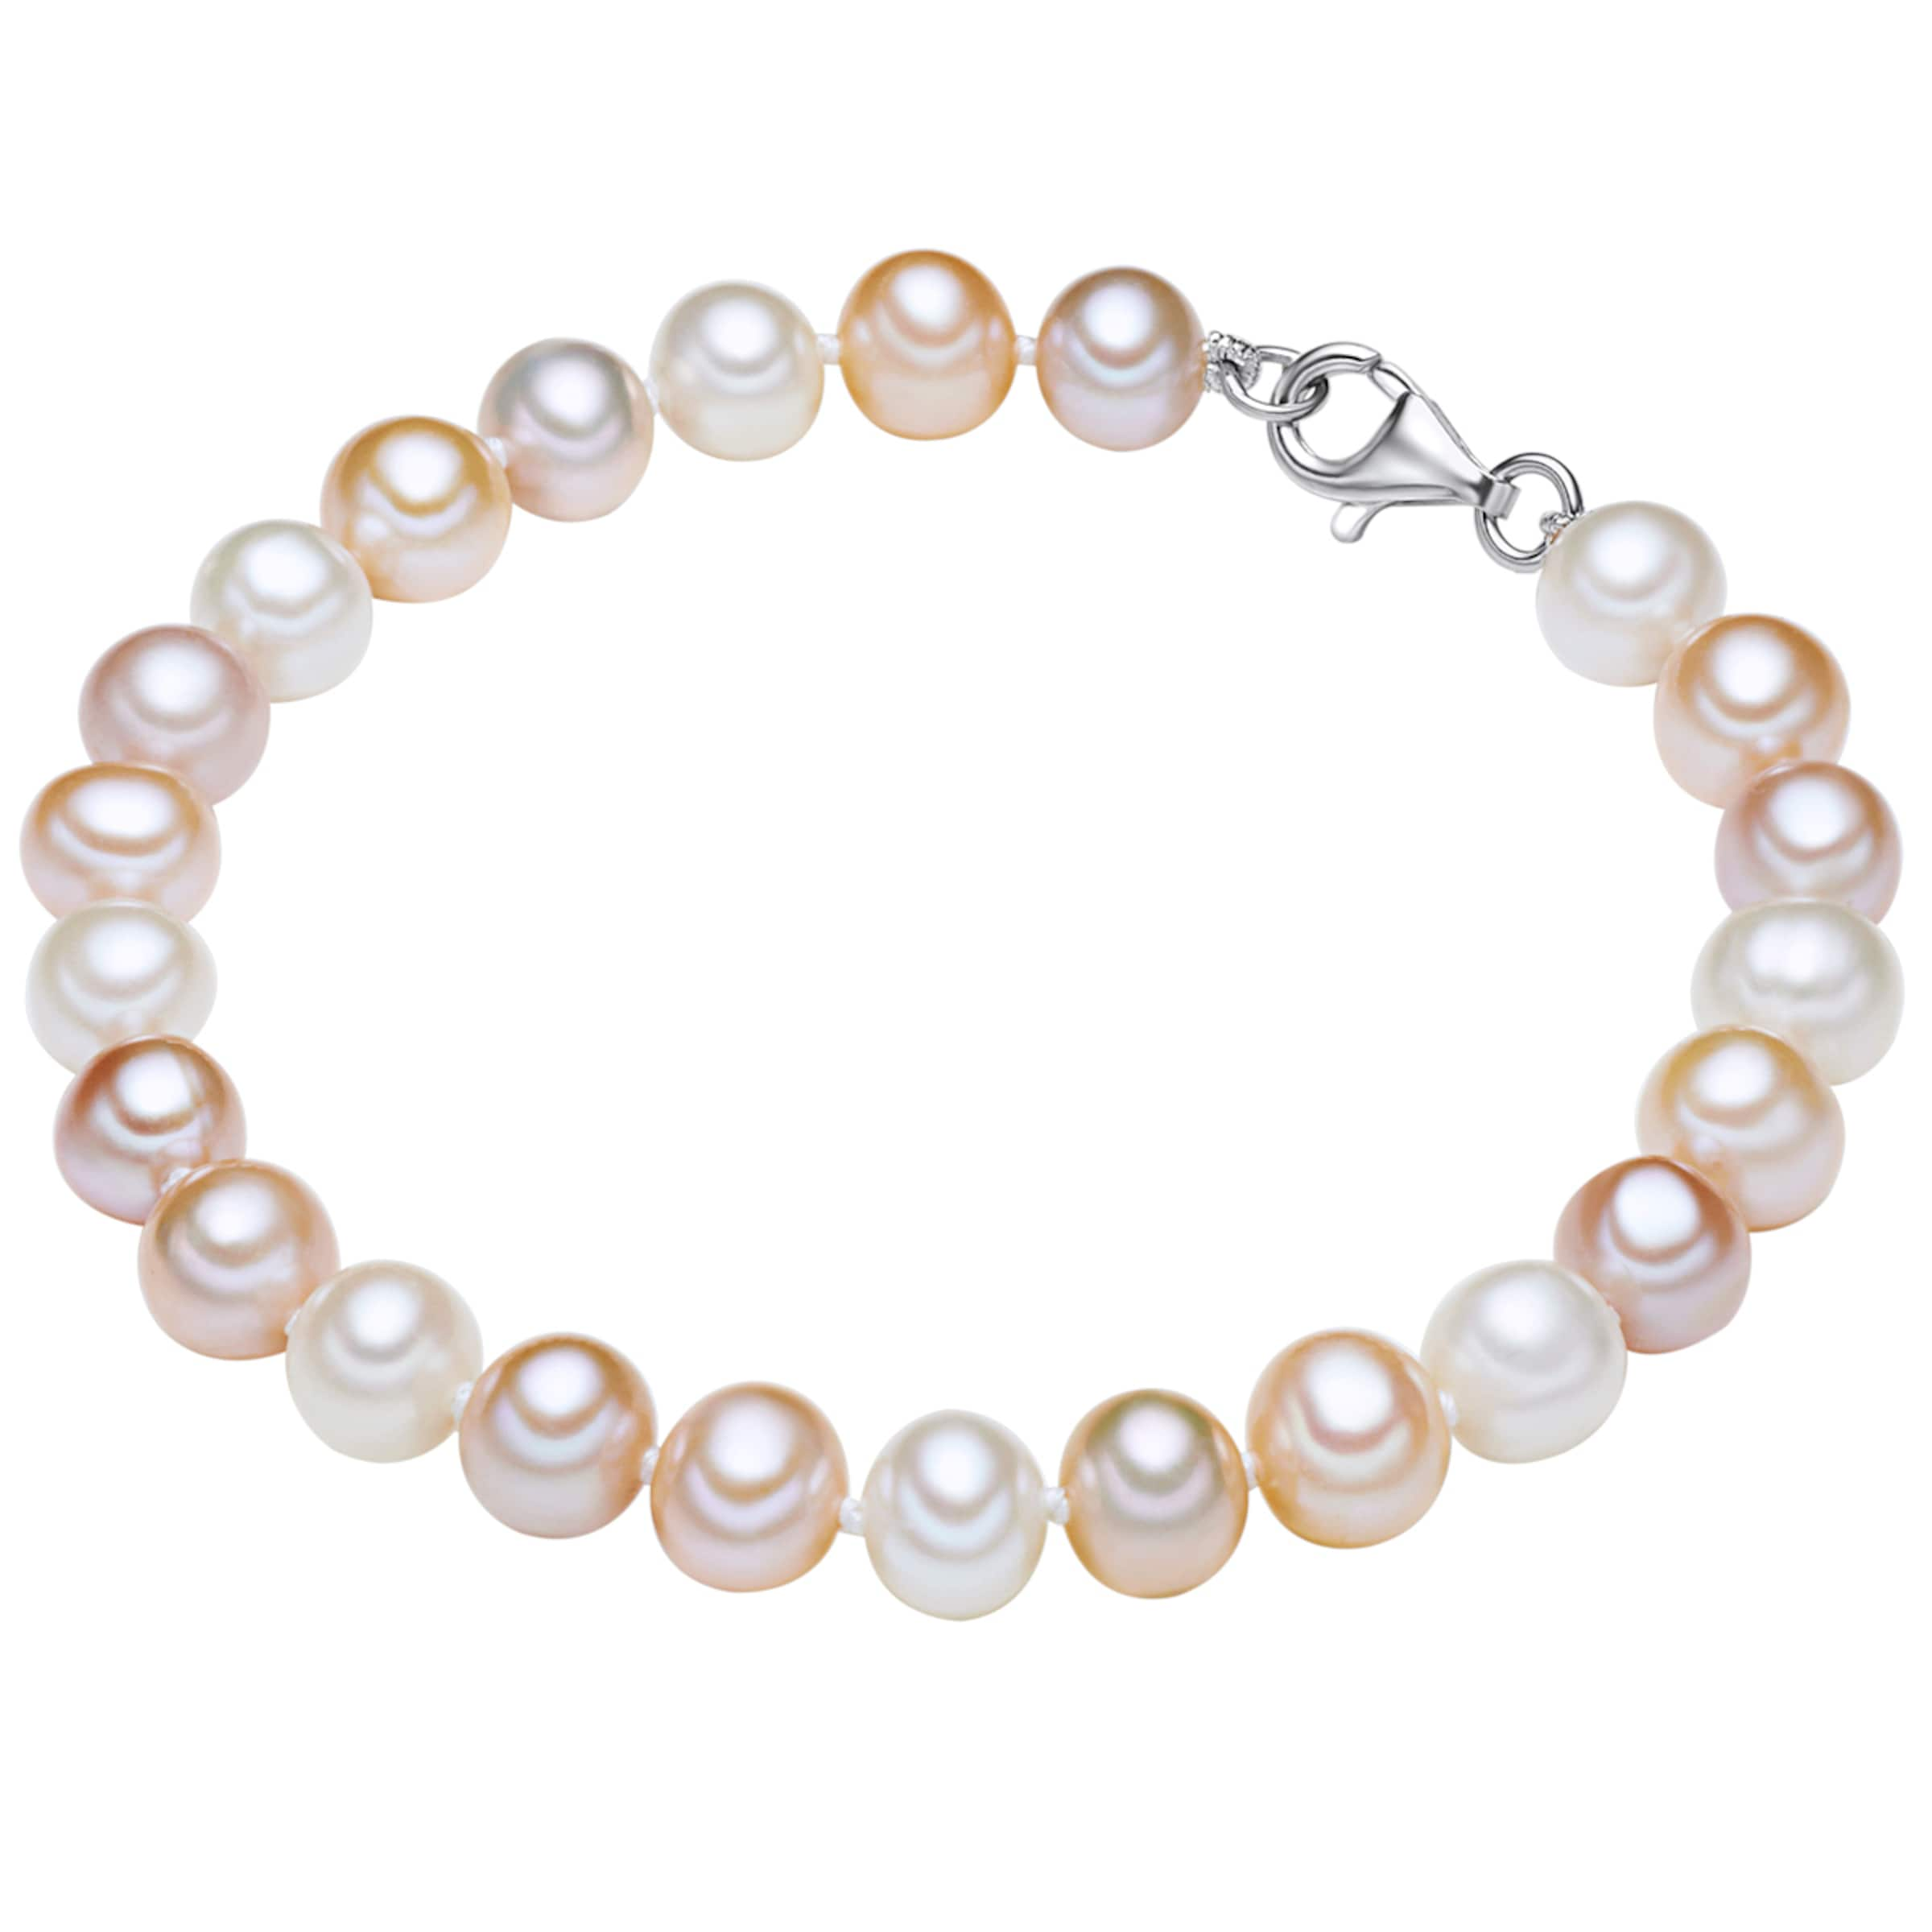 Valero Creme Creme Armband Pearls Armband In Valero Pearls In zSqMVpUG